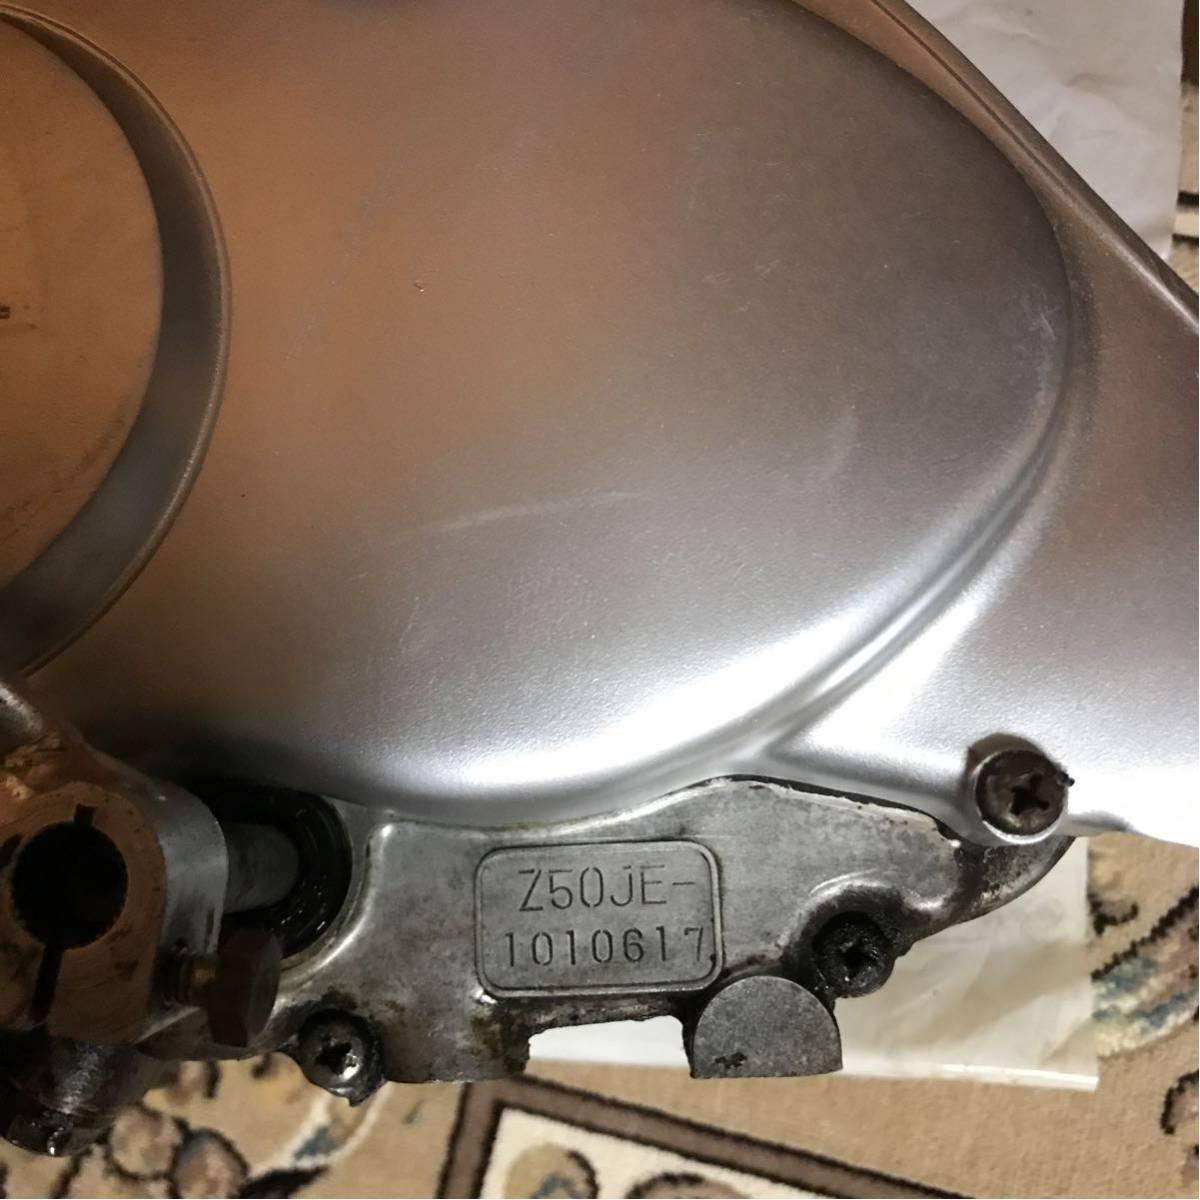 HONDA モンキーエンジン 初期型? 部品どり オーバーホール シャリー ダックス カブ 当時物 希少_画像3